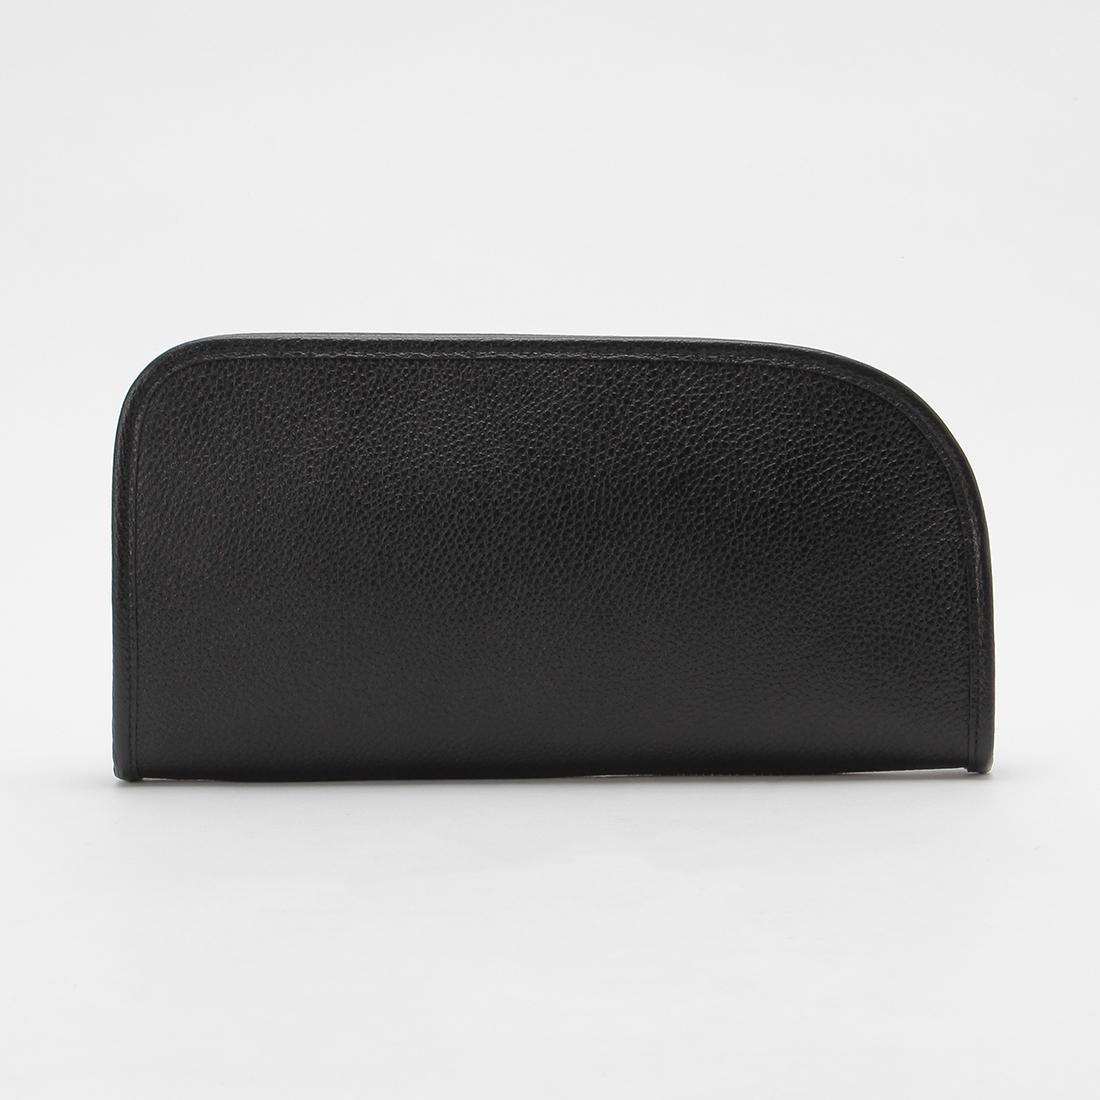 Clutch Bag 2012683: Black